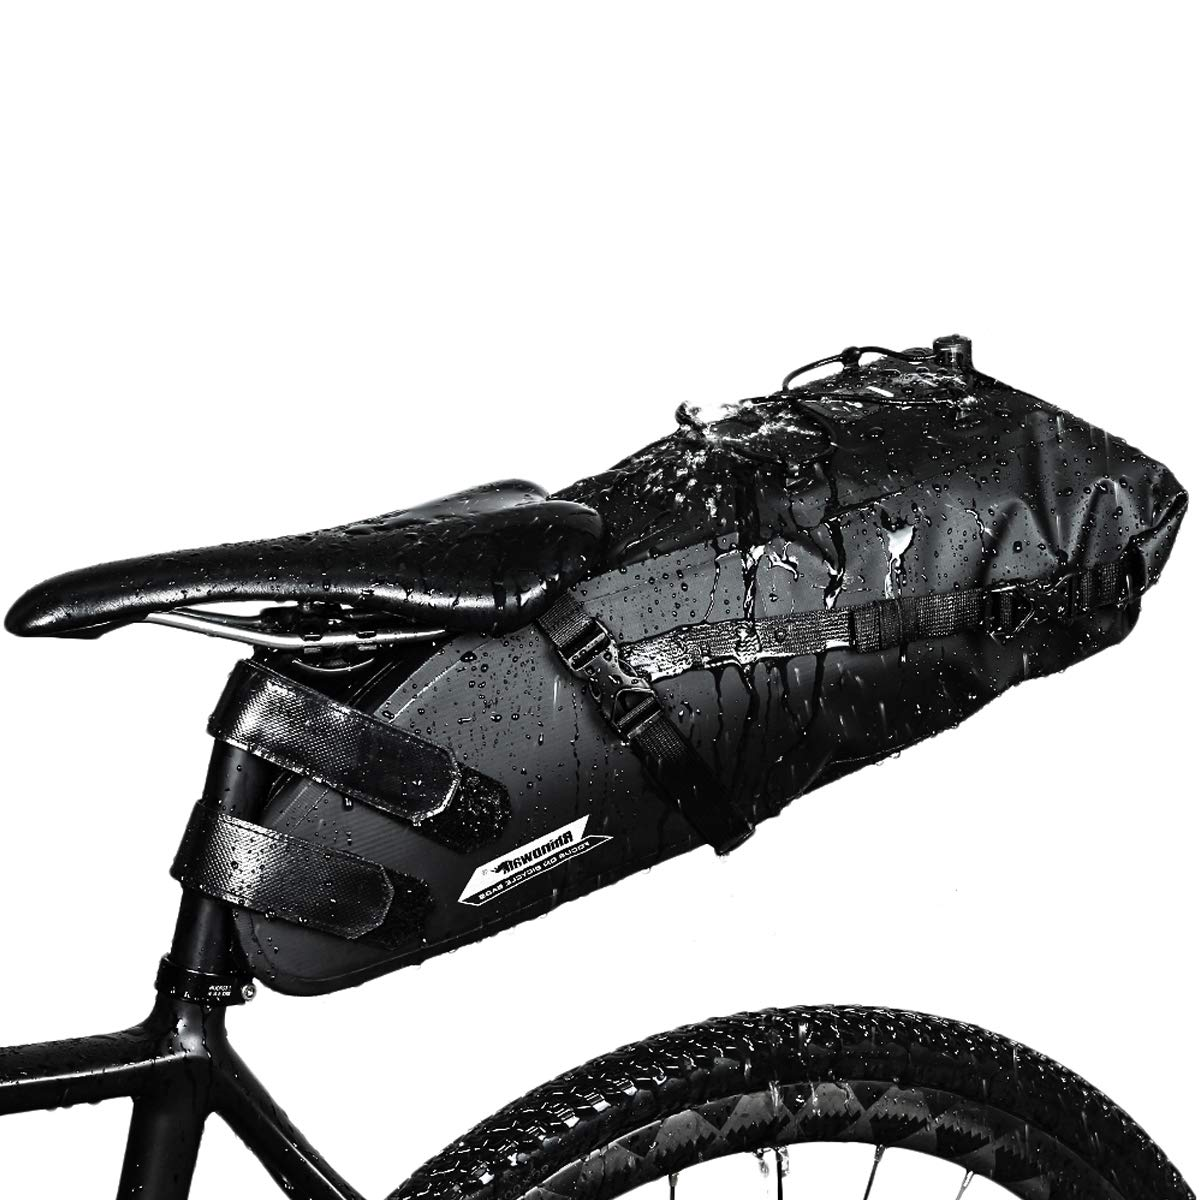 CamGo Bike Saddle Bag 10L – Waterproof Cycling Tail Bag Strap-on Bike Under Seat Bag for Mountain Road MTB Bike